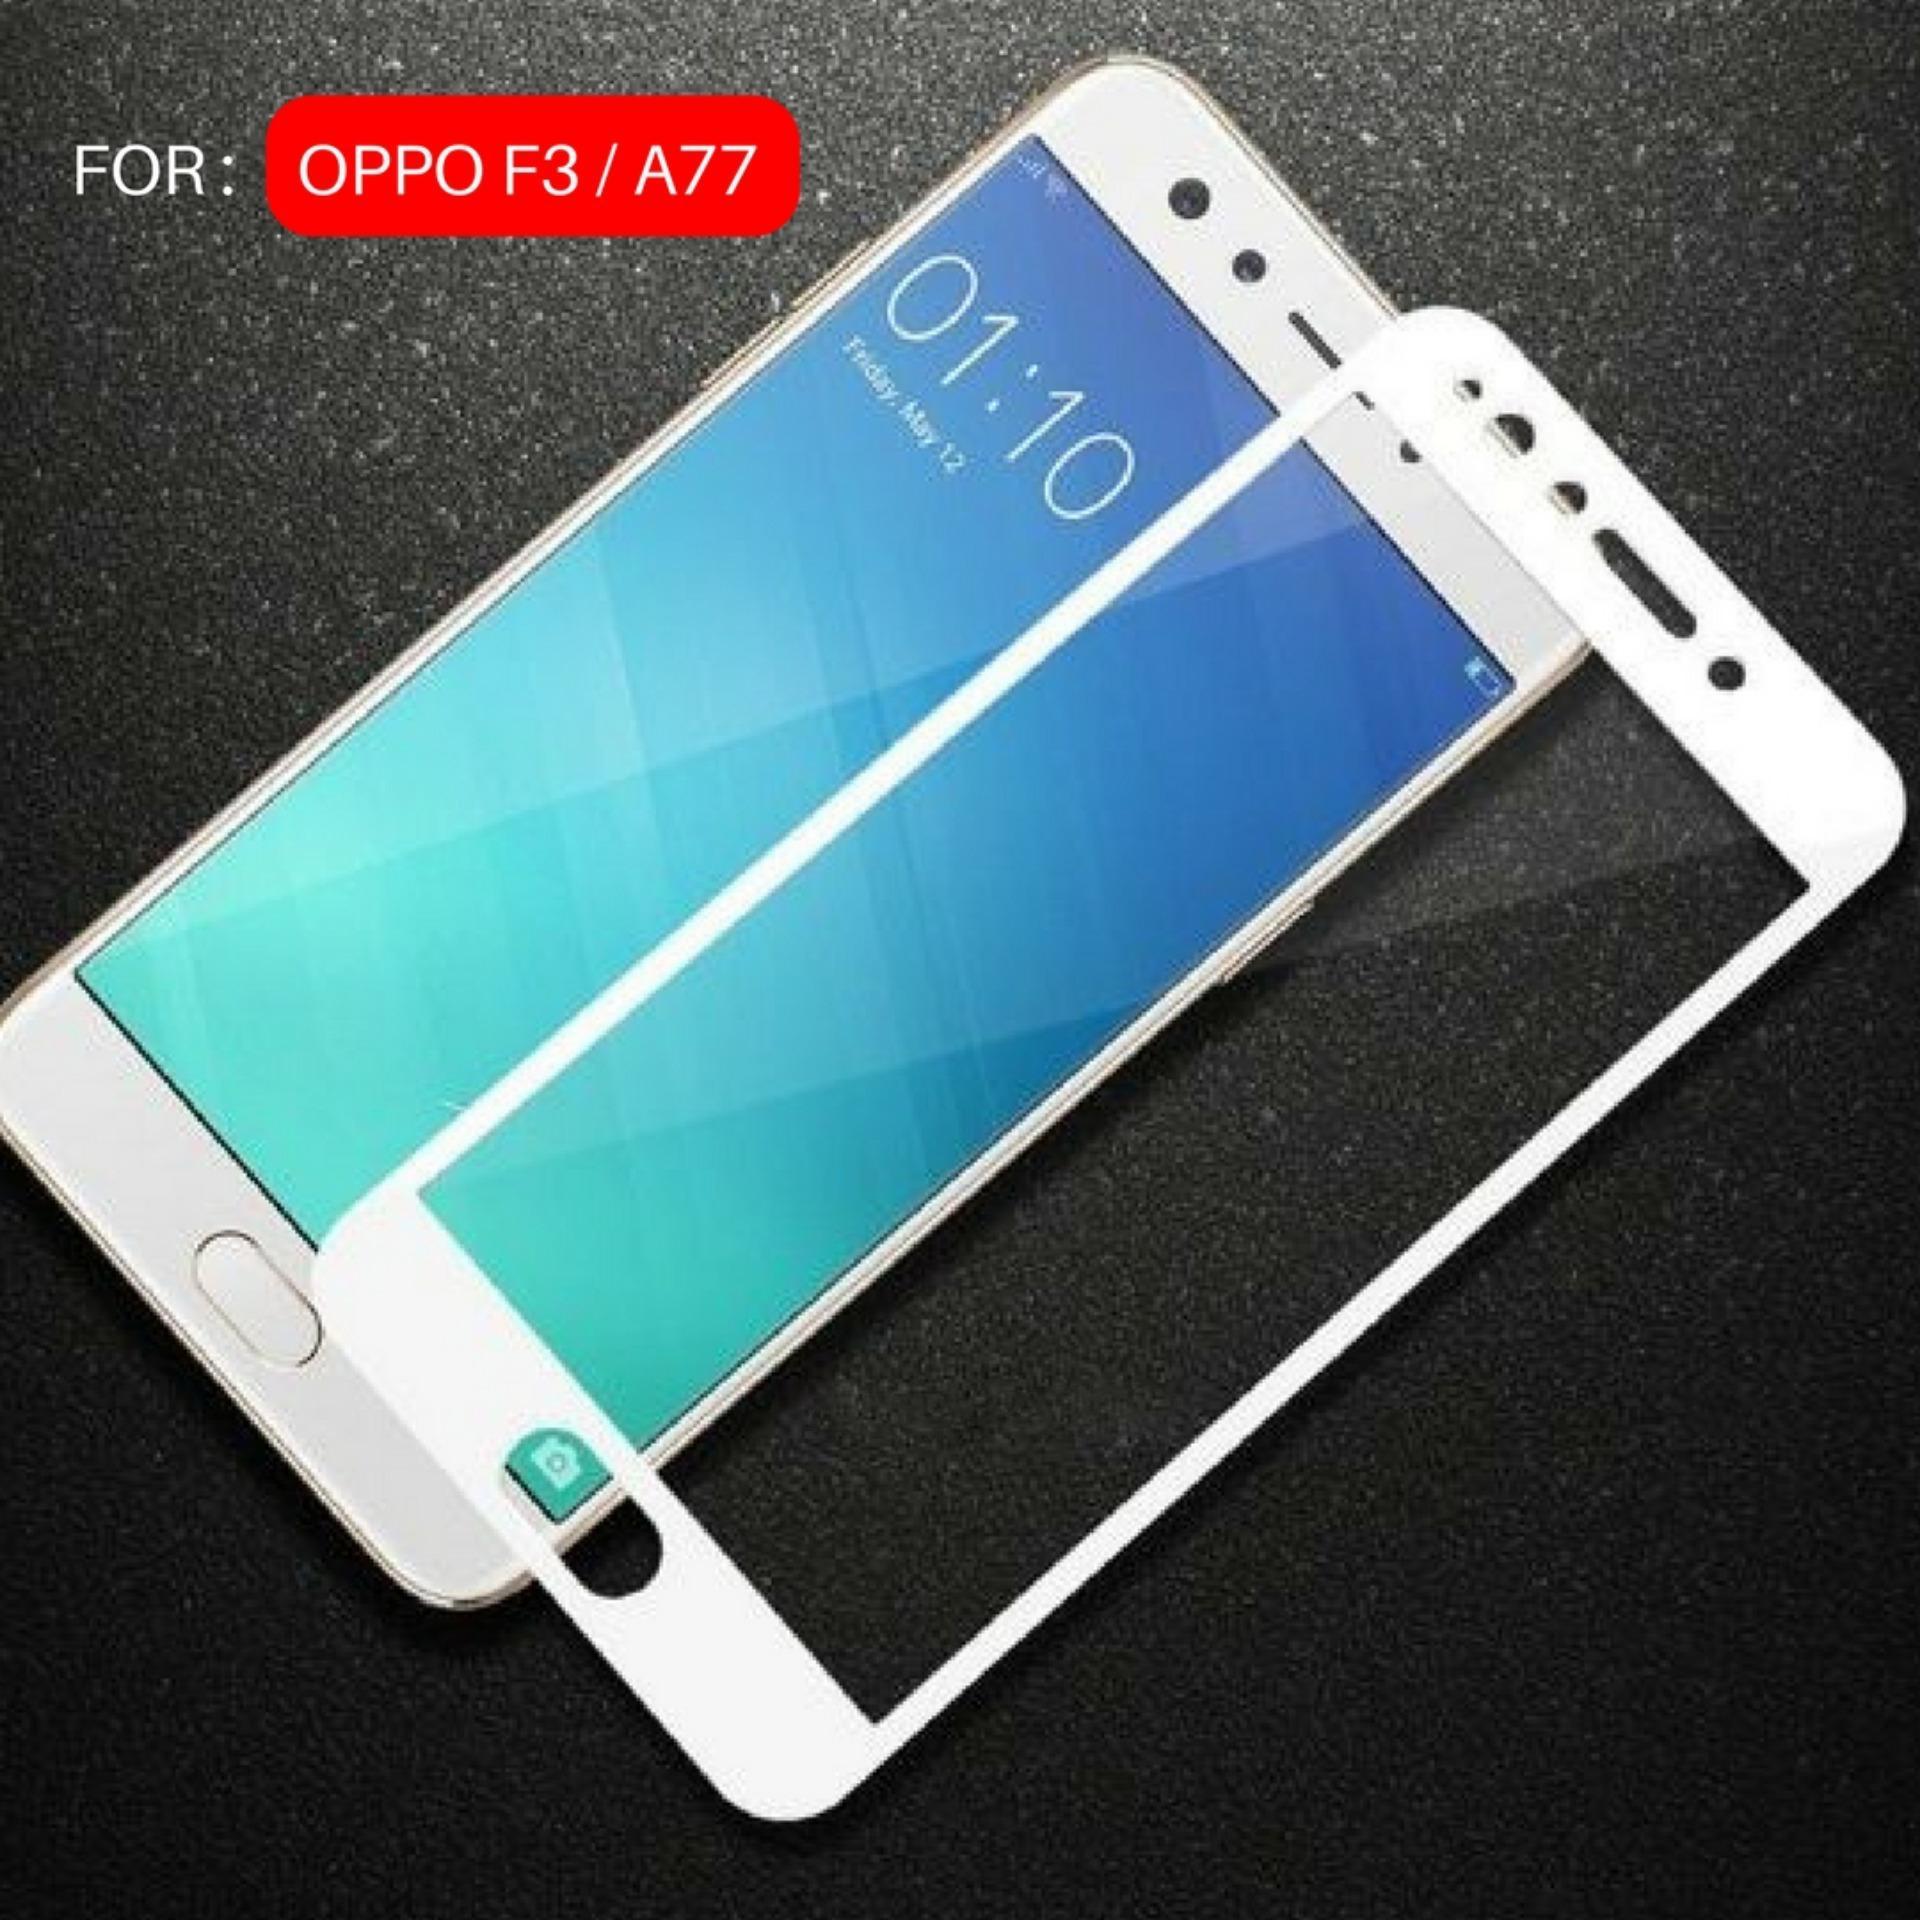 Kenzoe Tempered Glass Warna Full Corning Screen Protector For OPPO F3 (A77) - White